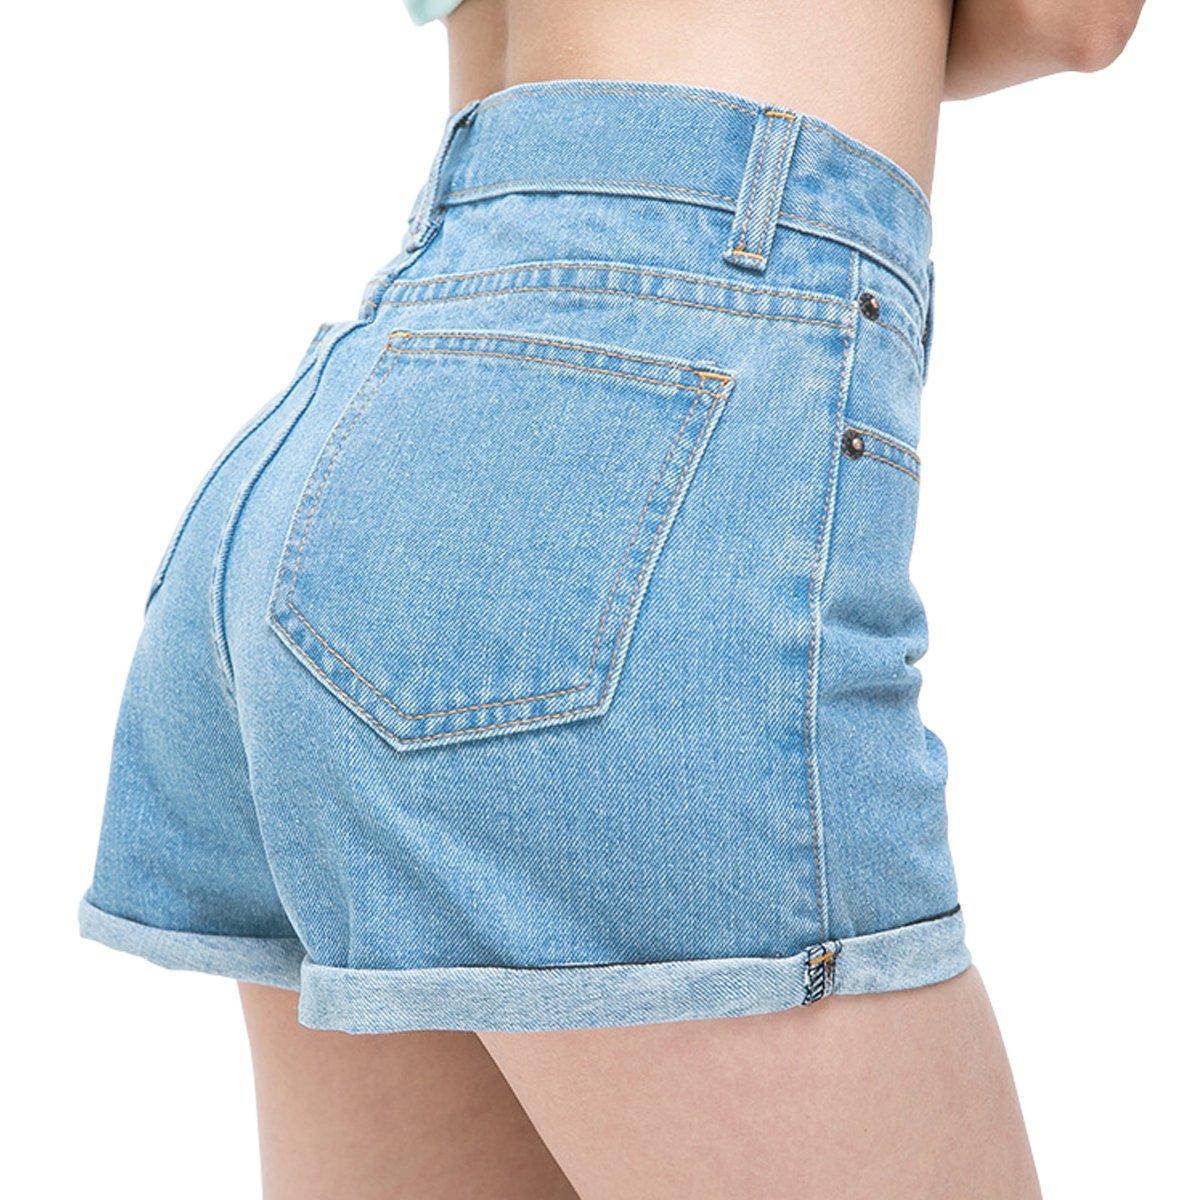 Womtop Summer Women Shorts Vintage Retro Junior Jean Shorts High Waist Crimping Denim Shorts Women (XL, Blue)